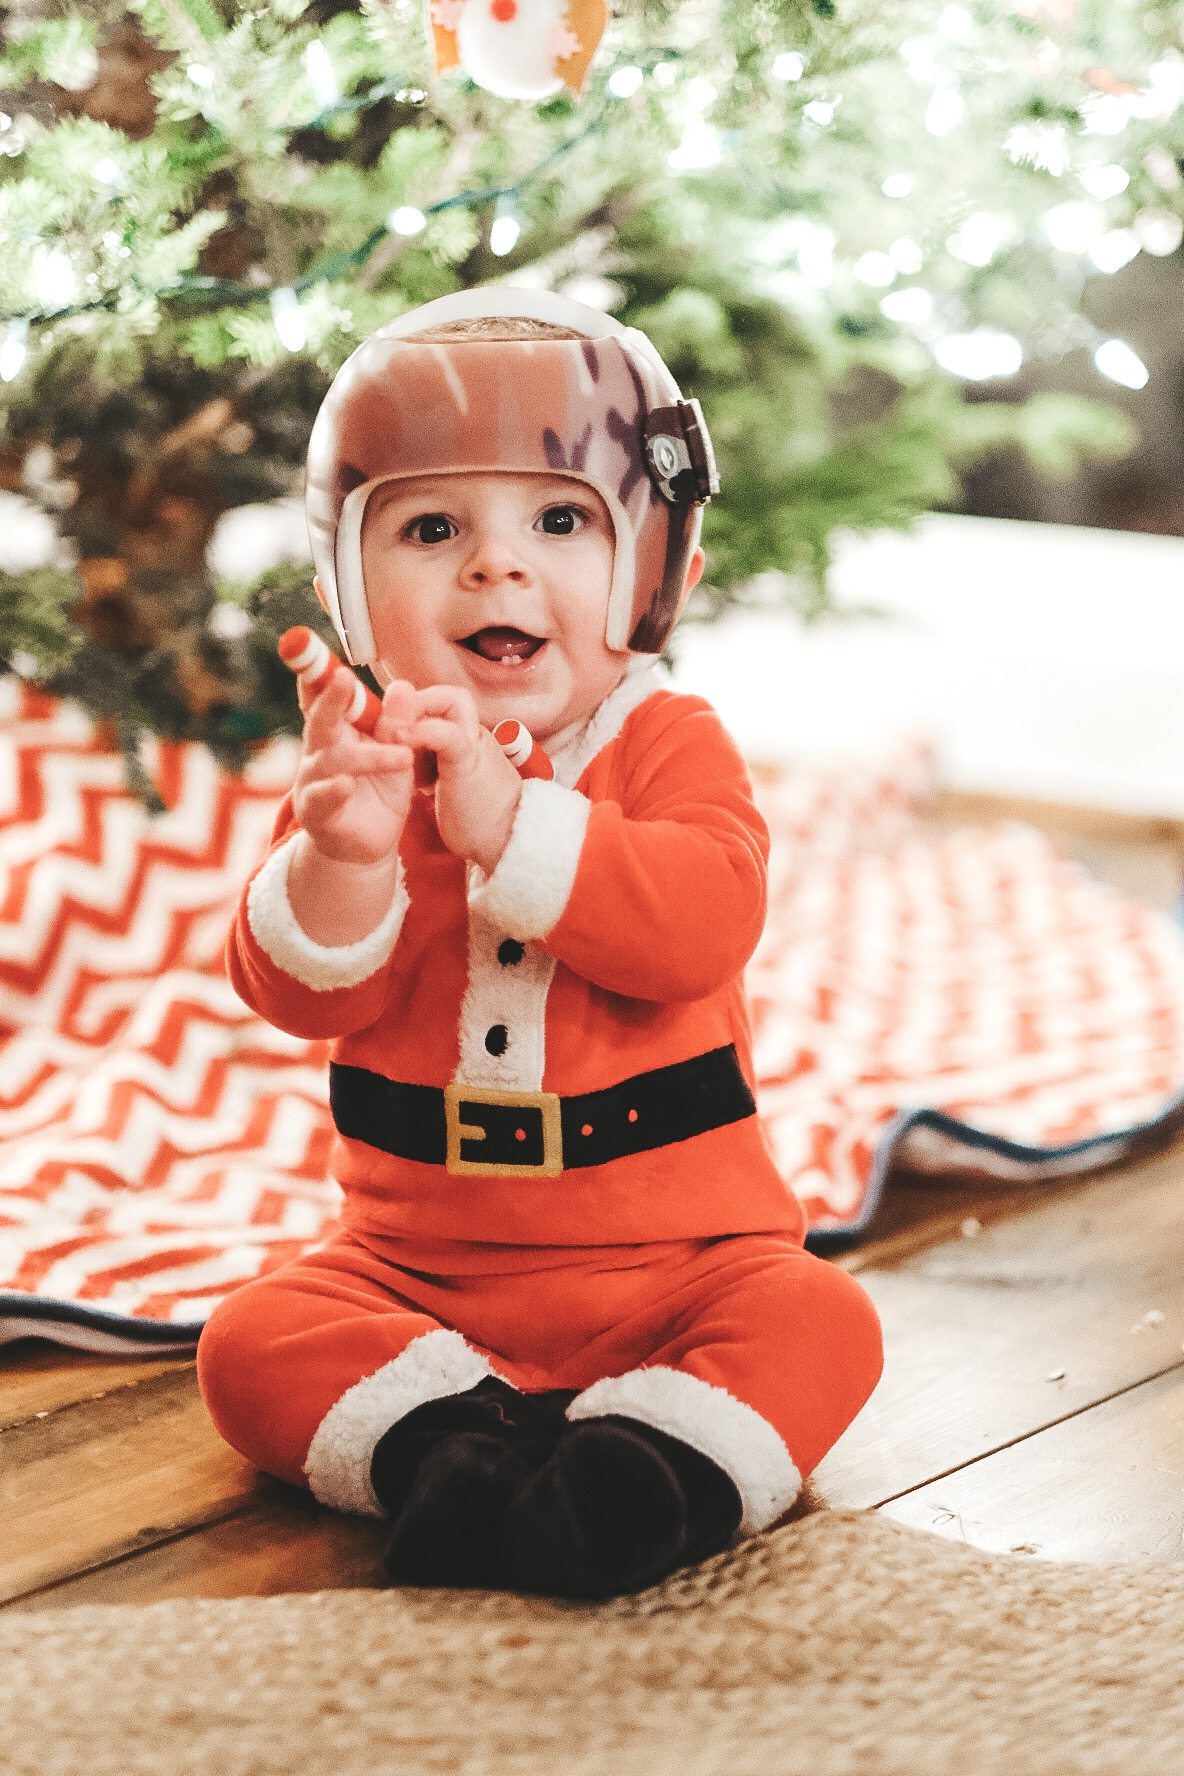 Jett Jones, 8 Months Old. Christmas baby photos.  Starband helmet.